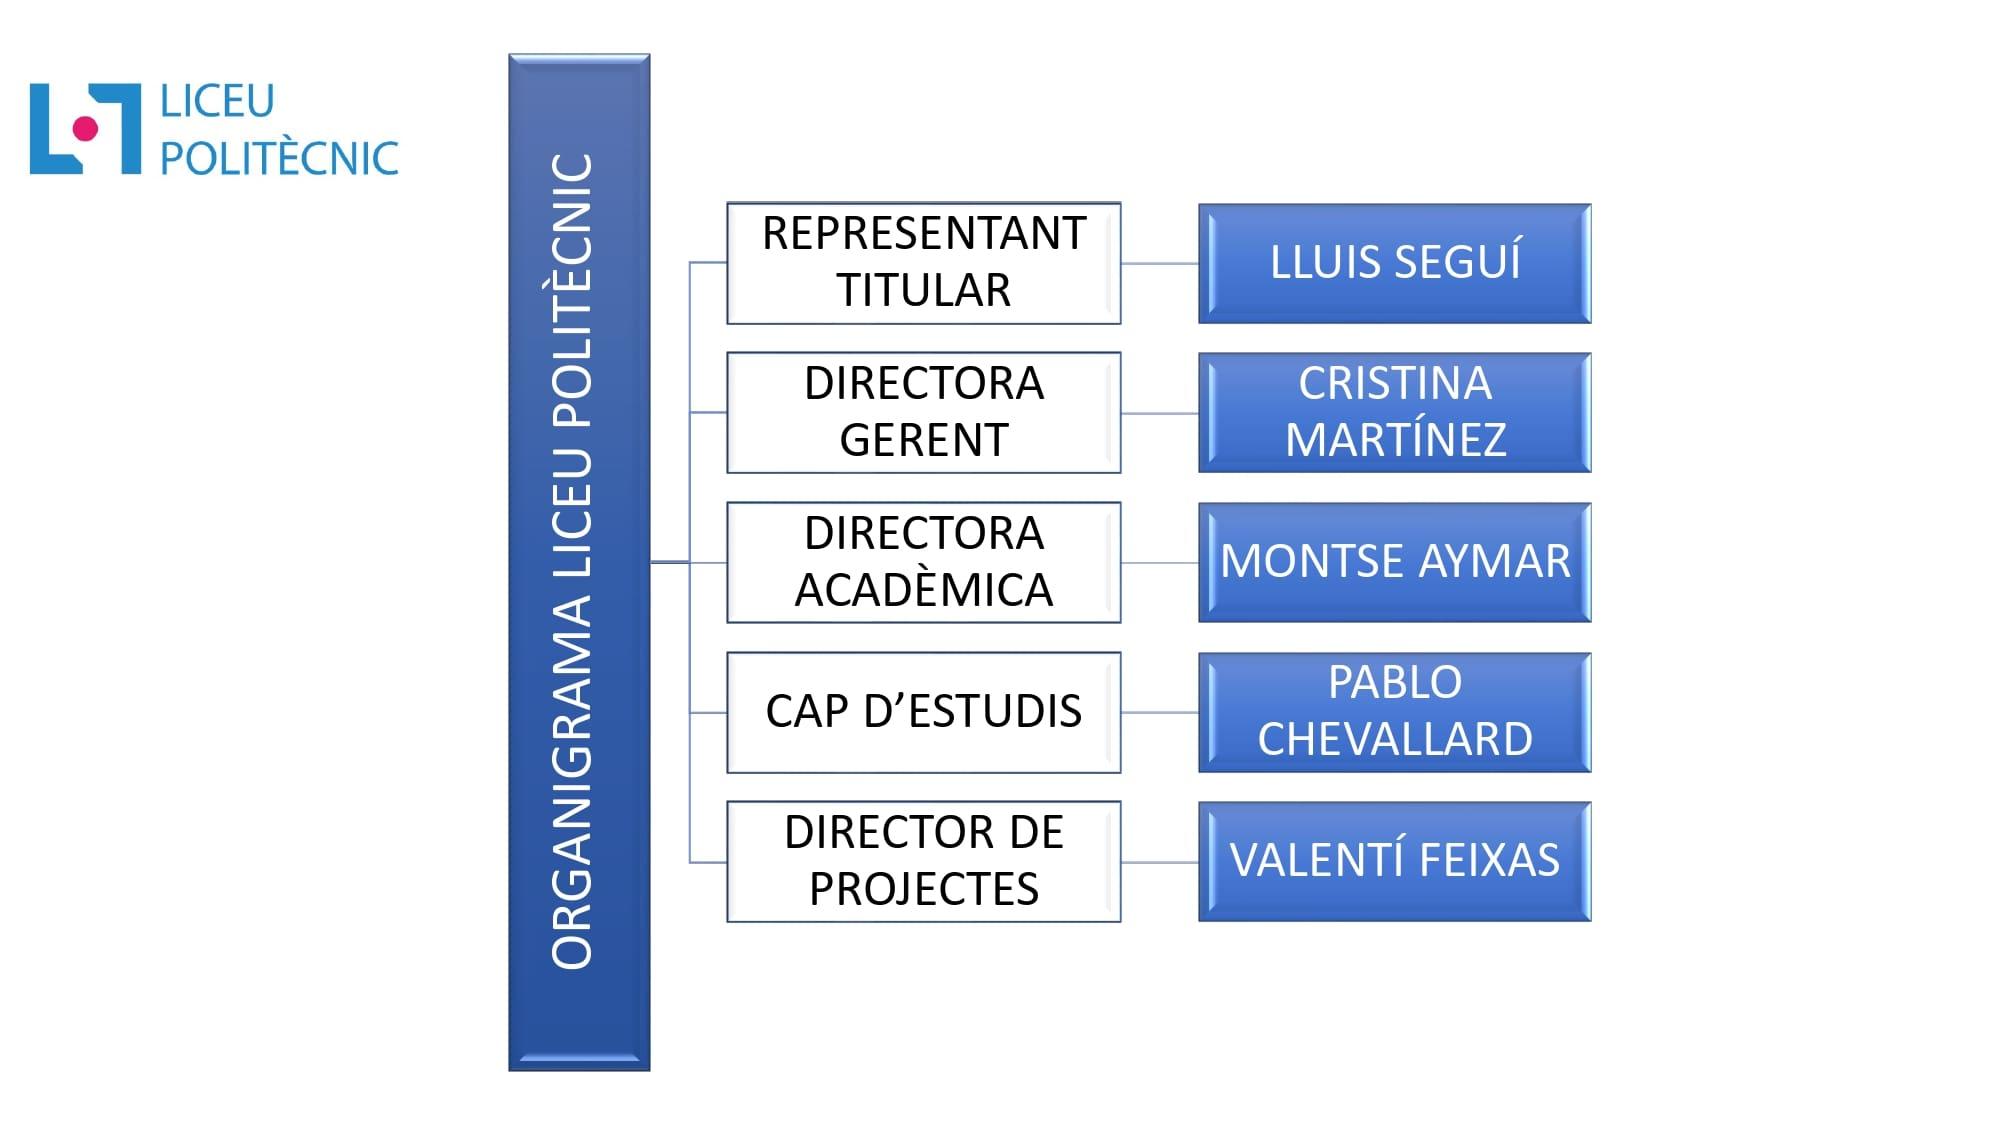 Organigrama LICEU POLITECNIC